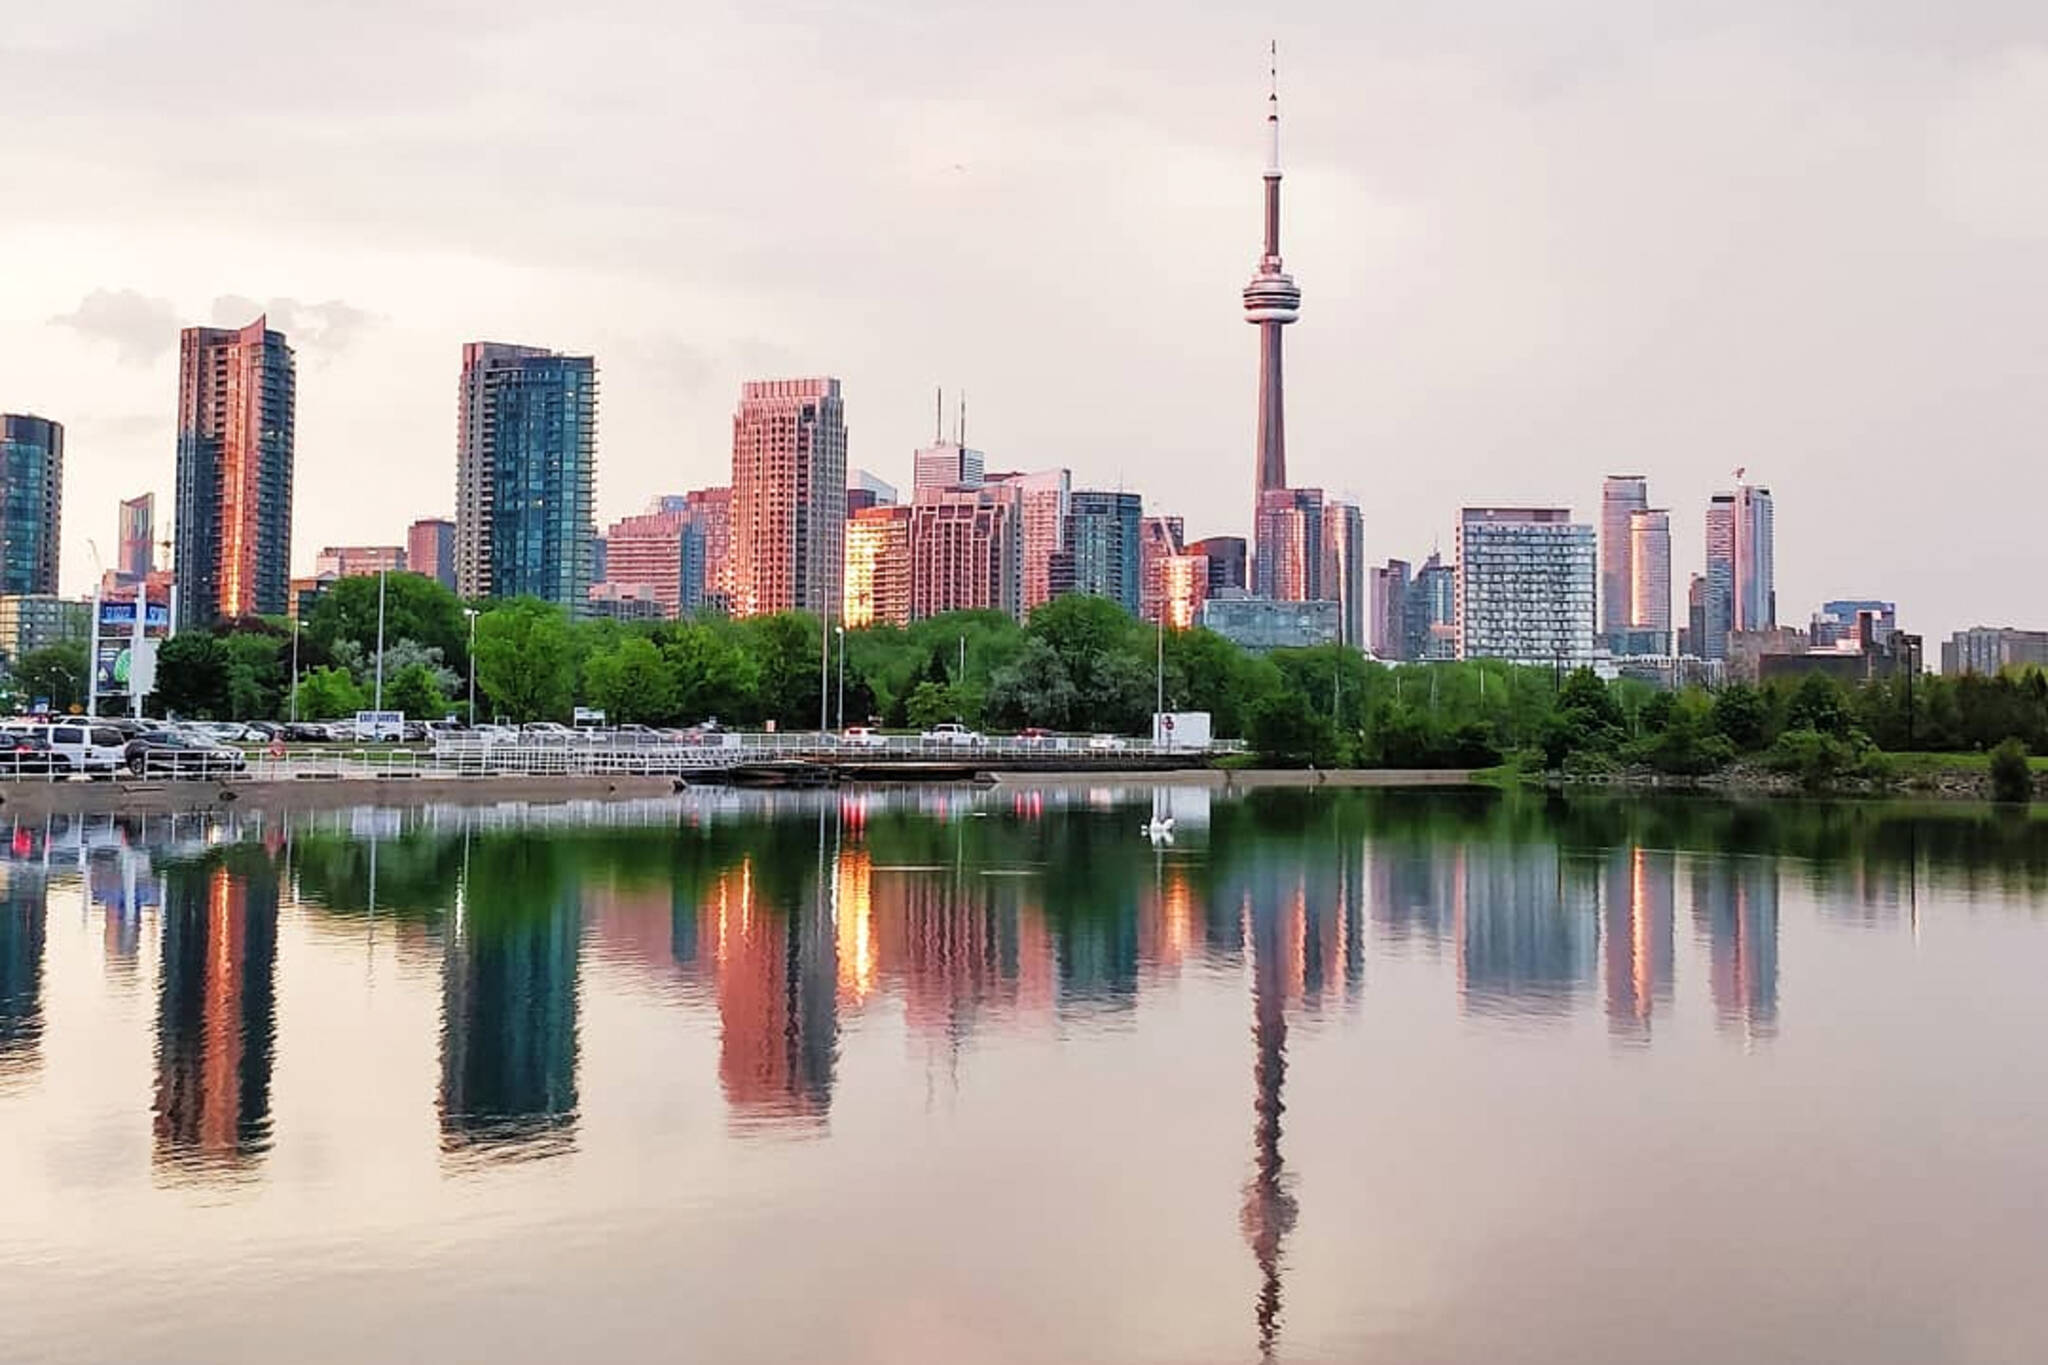 Sidewalk Toronto 307